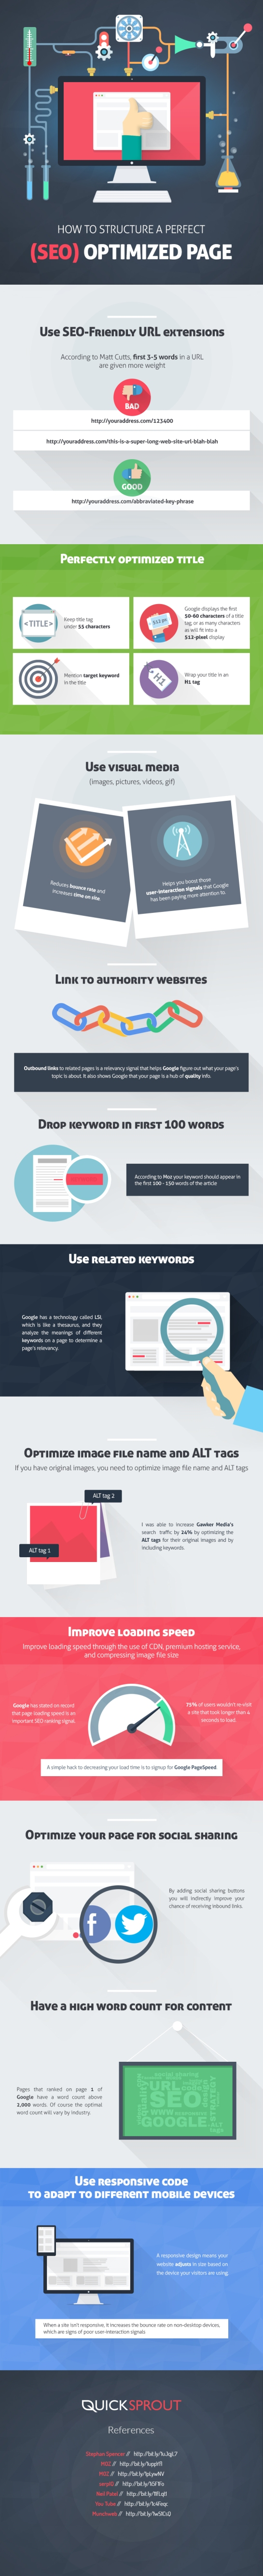 Structure d'une page SEO-friendly - Infographie